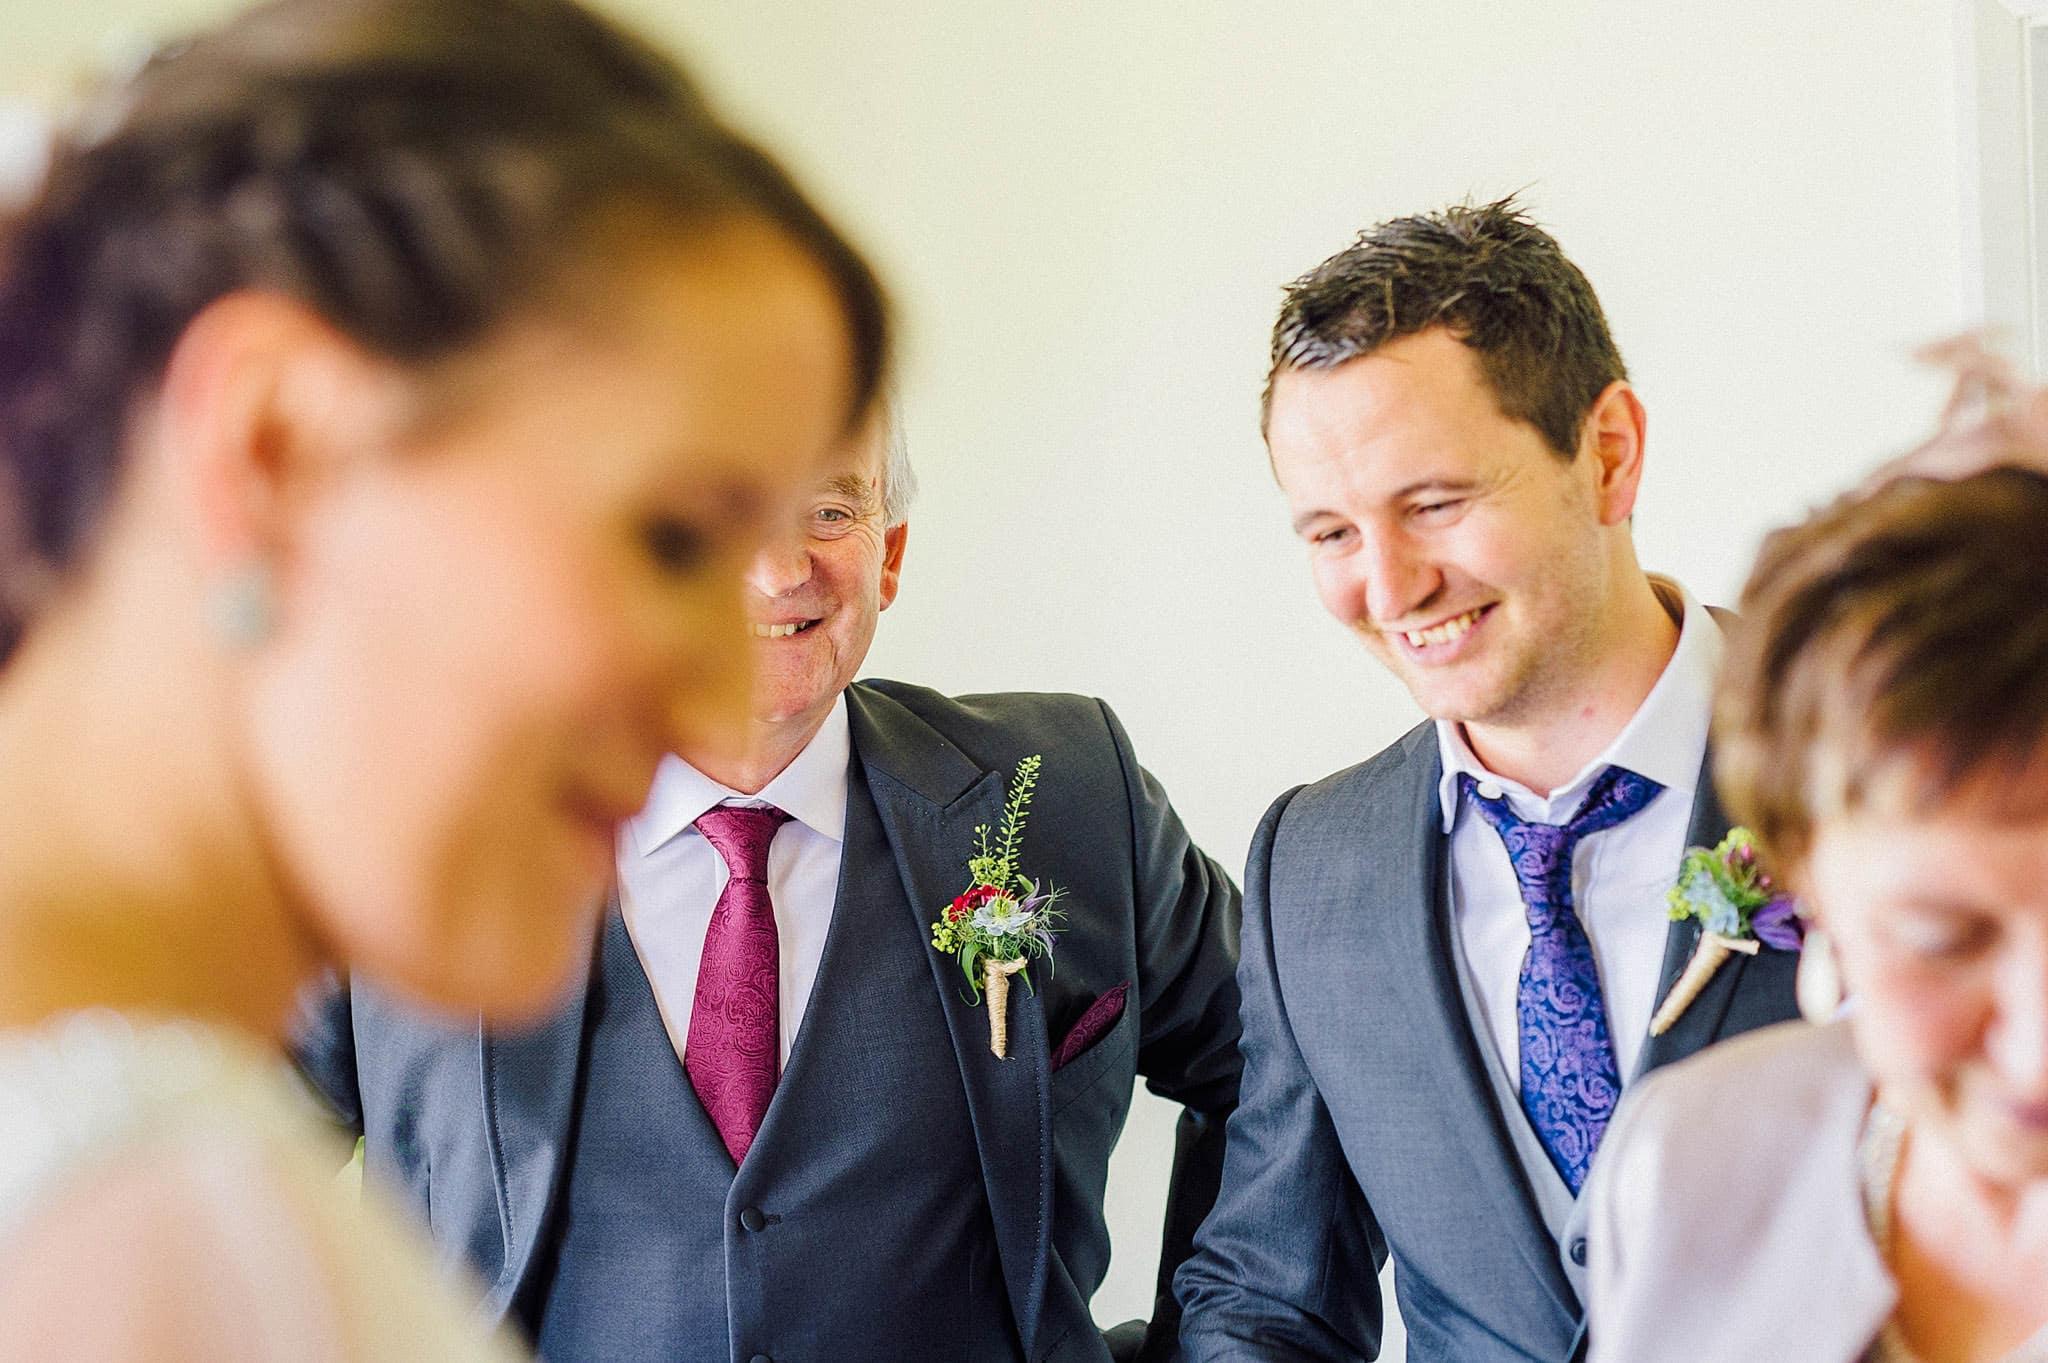 wedding-photographer-aberystwyth-wales (21)